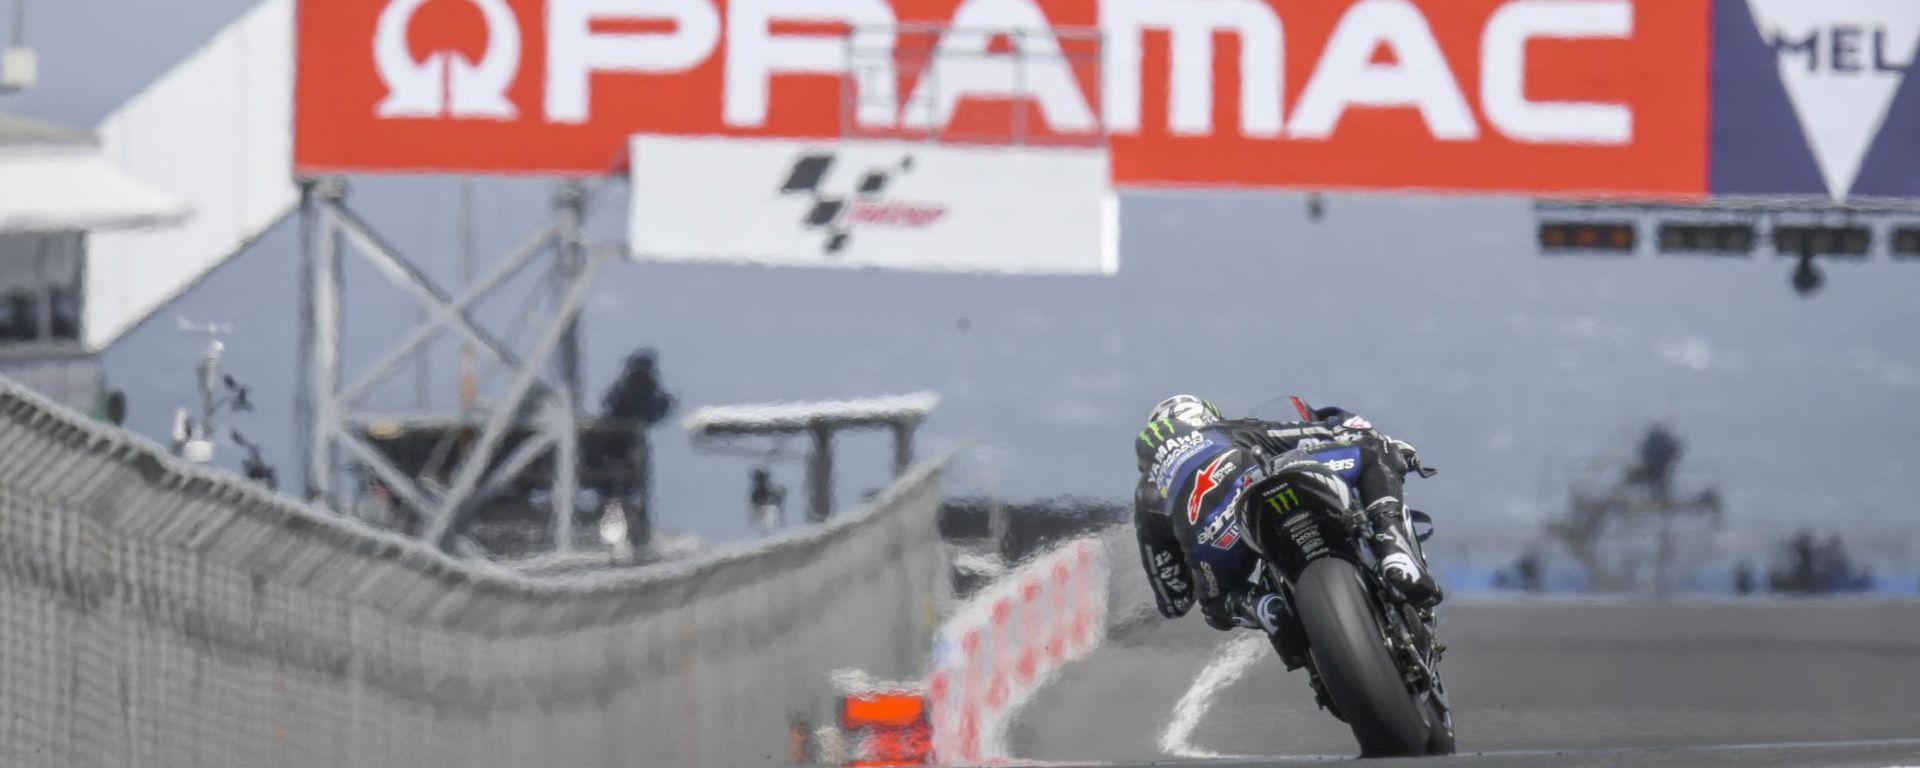 MotoGP Australia 2019, Phillip Island: Maverick Vinales (Yamaha)